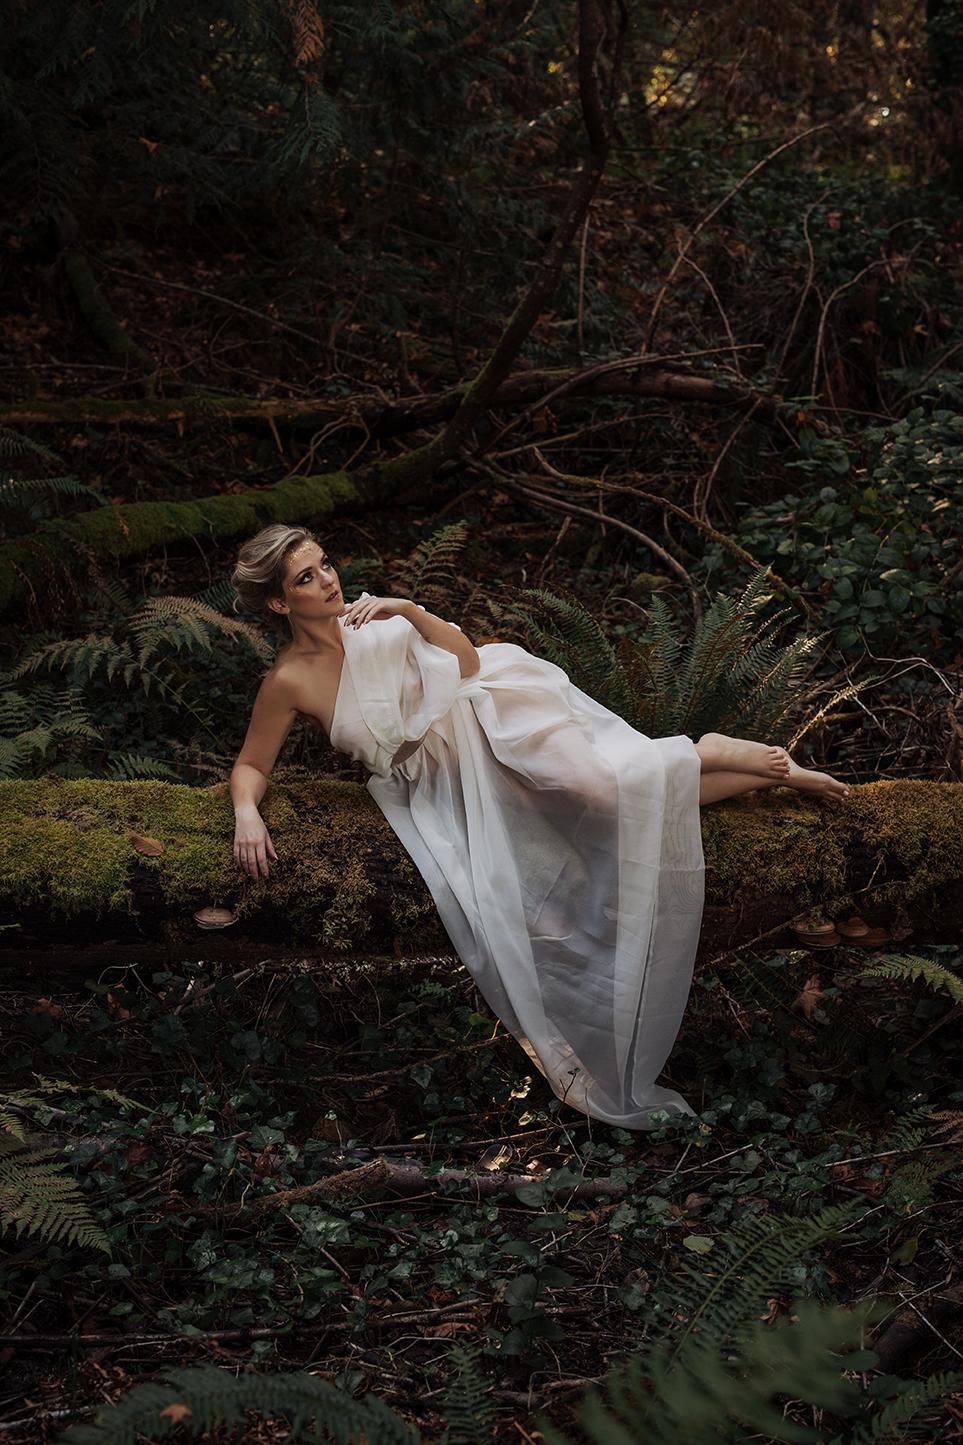 Victoria-BC-Outdoor-Boudoir-Moss-Photography-36.jpg